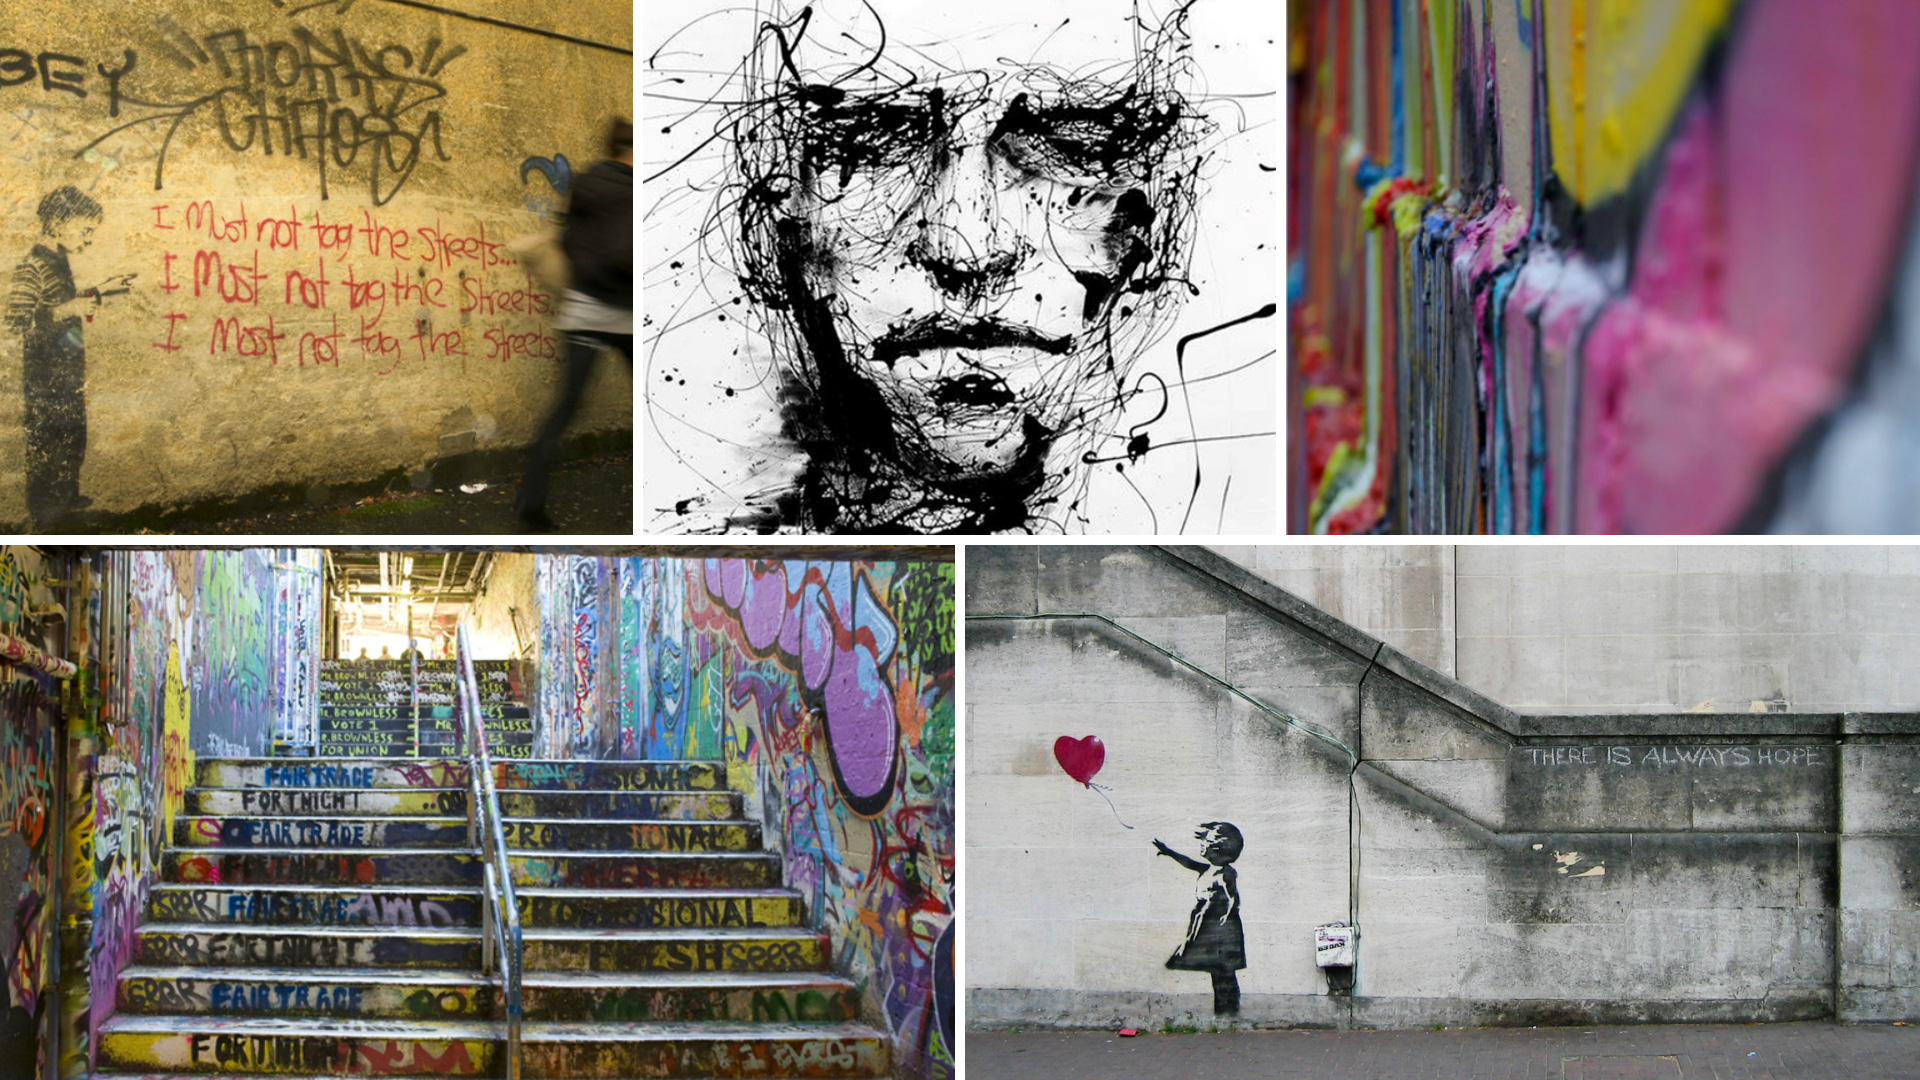 Graffiti art you could actually hang indoors